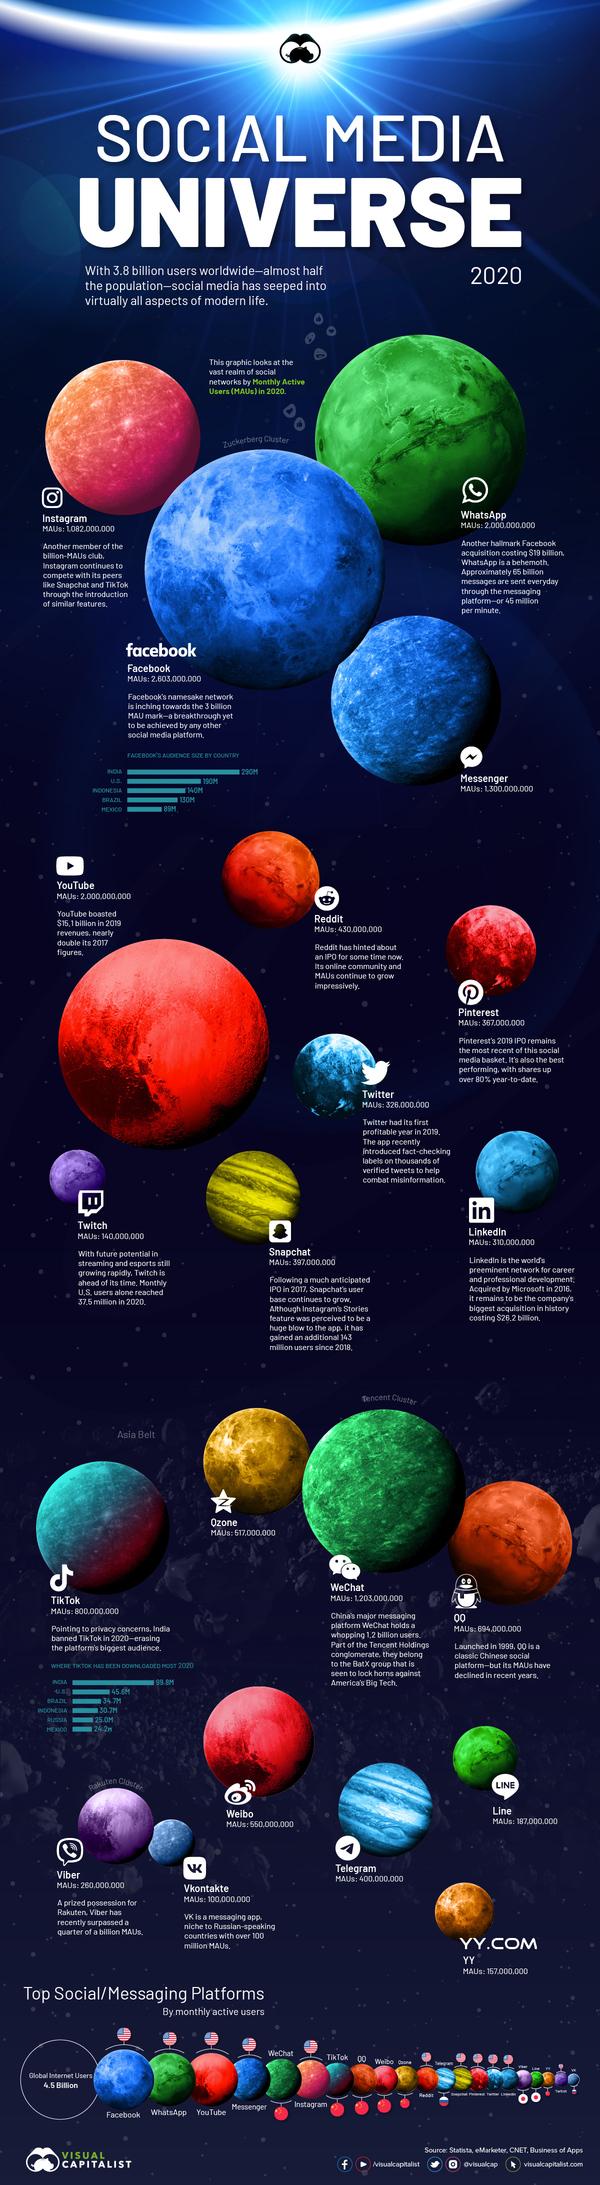 via https://www.visualcapitalist.com/visualizing-the-social-media-universe-in-2020/